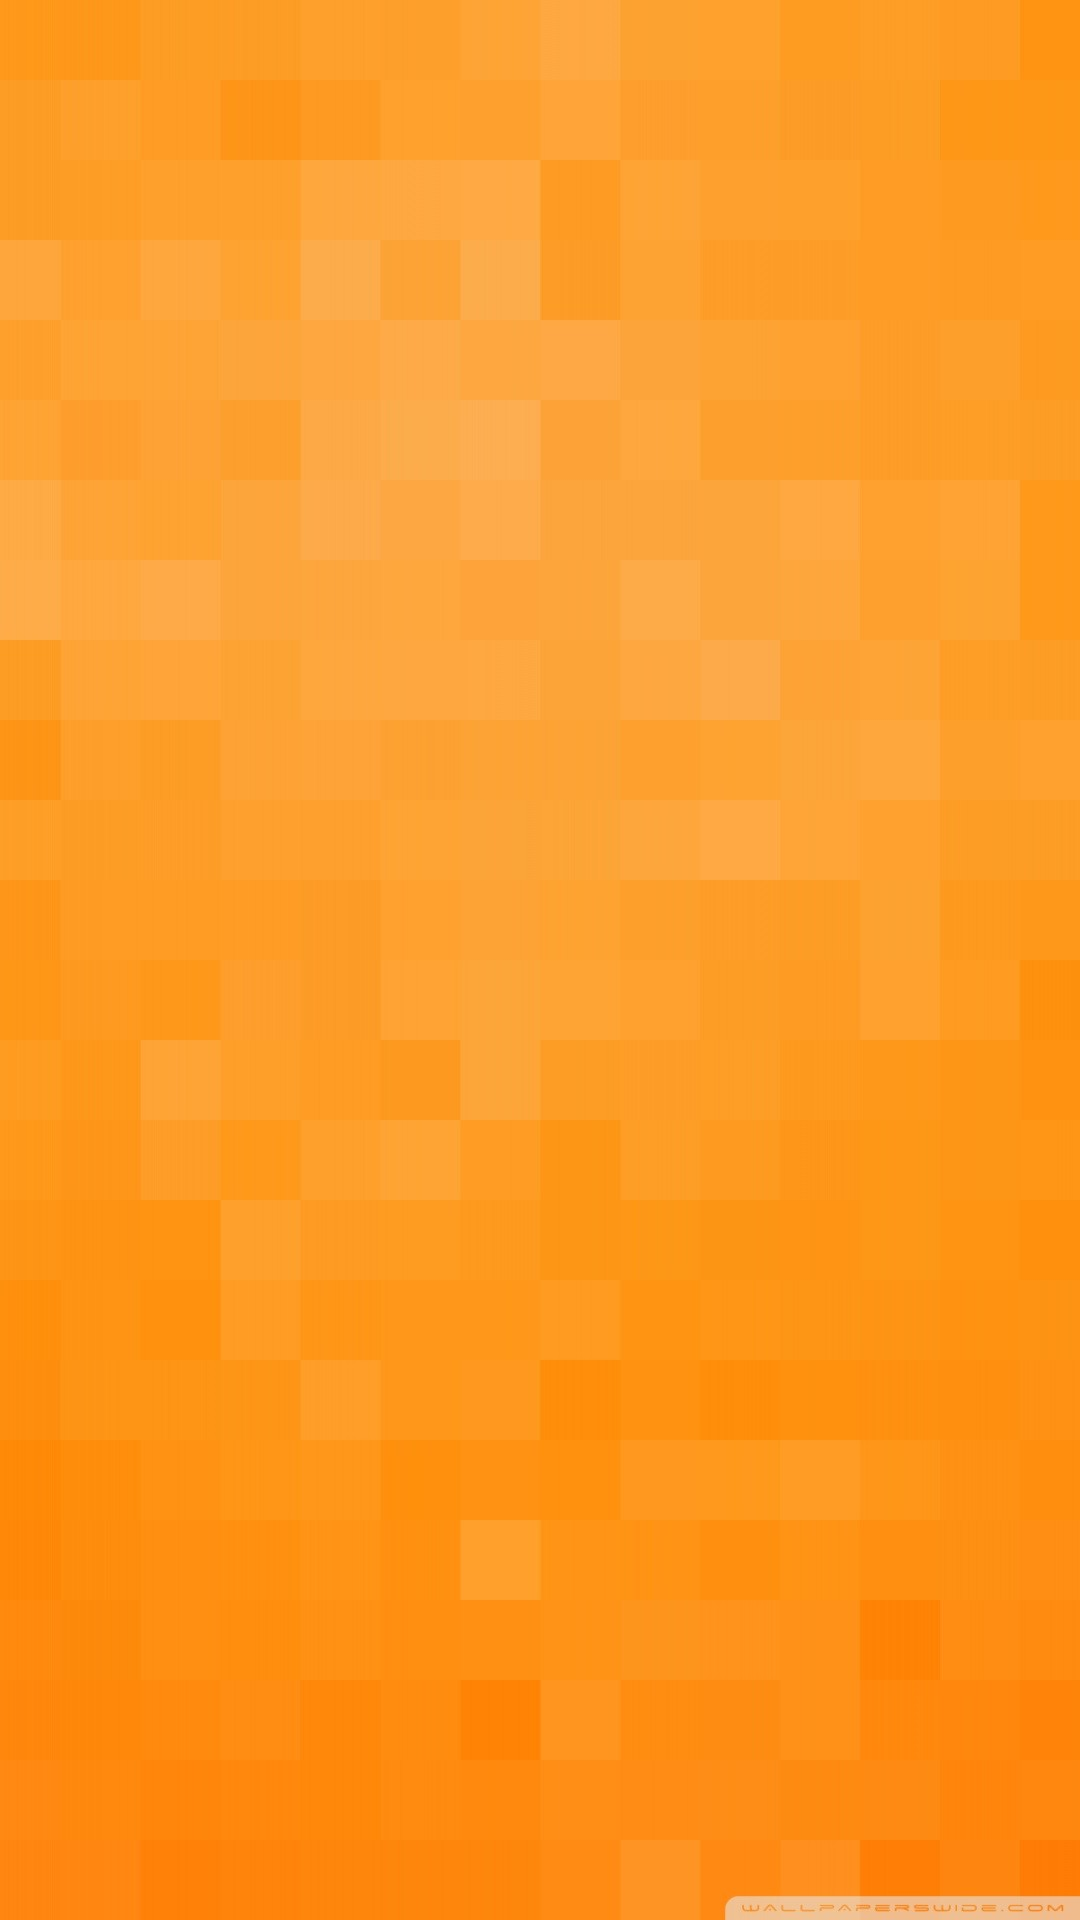 Free Orange Pixelated Background phone wallpaper by AuroraCadaver